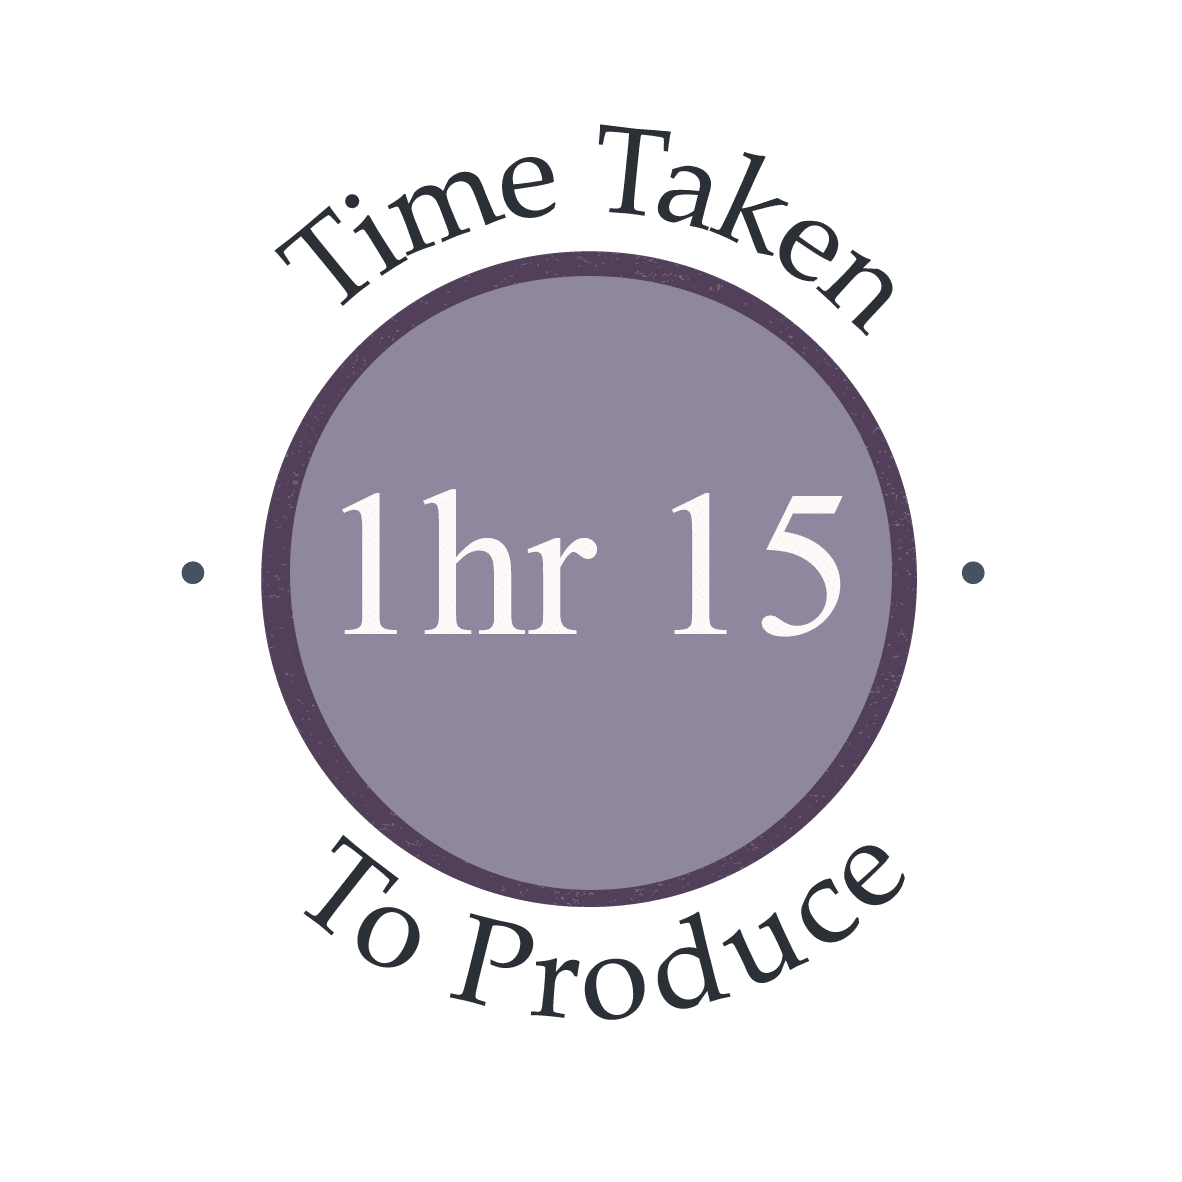 1 hour 15 minutes to make recipe